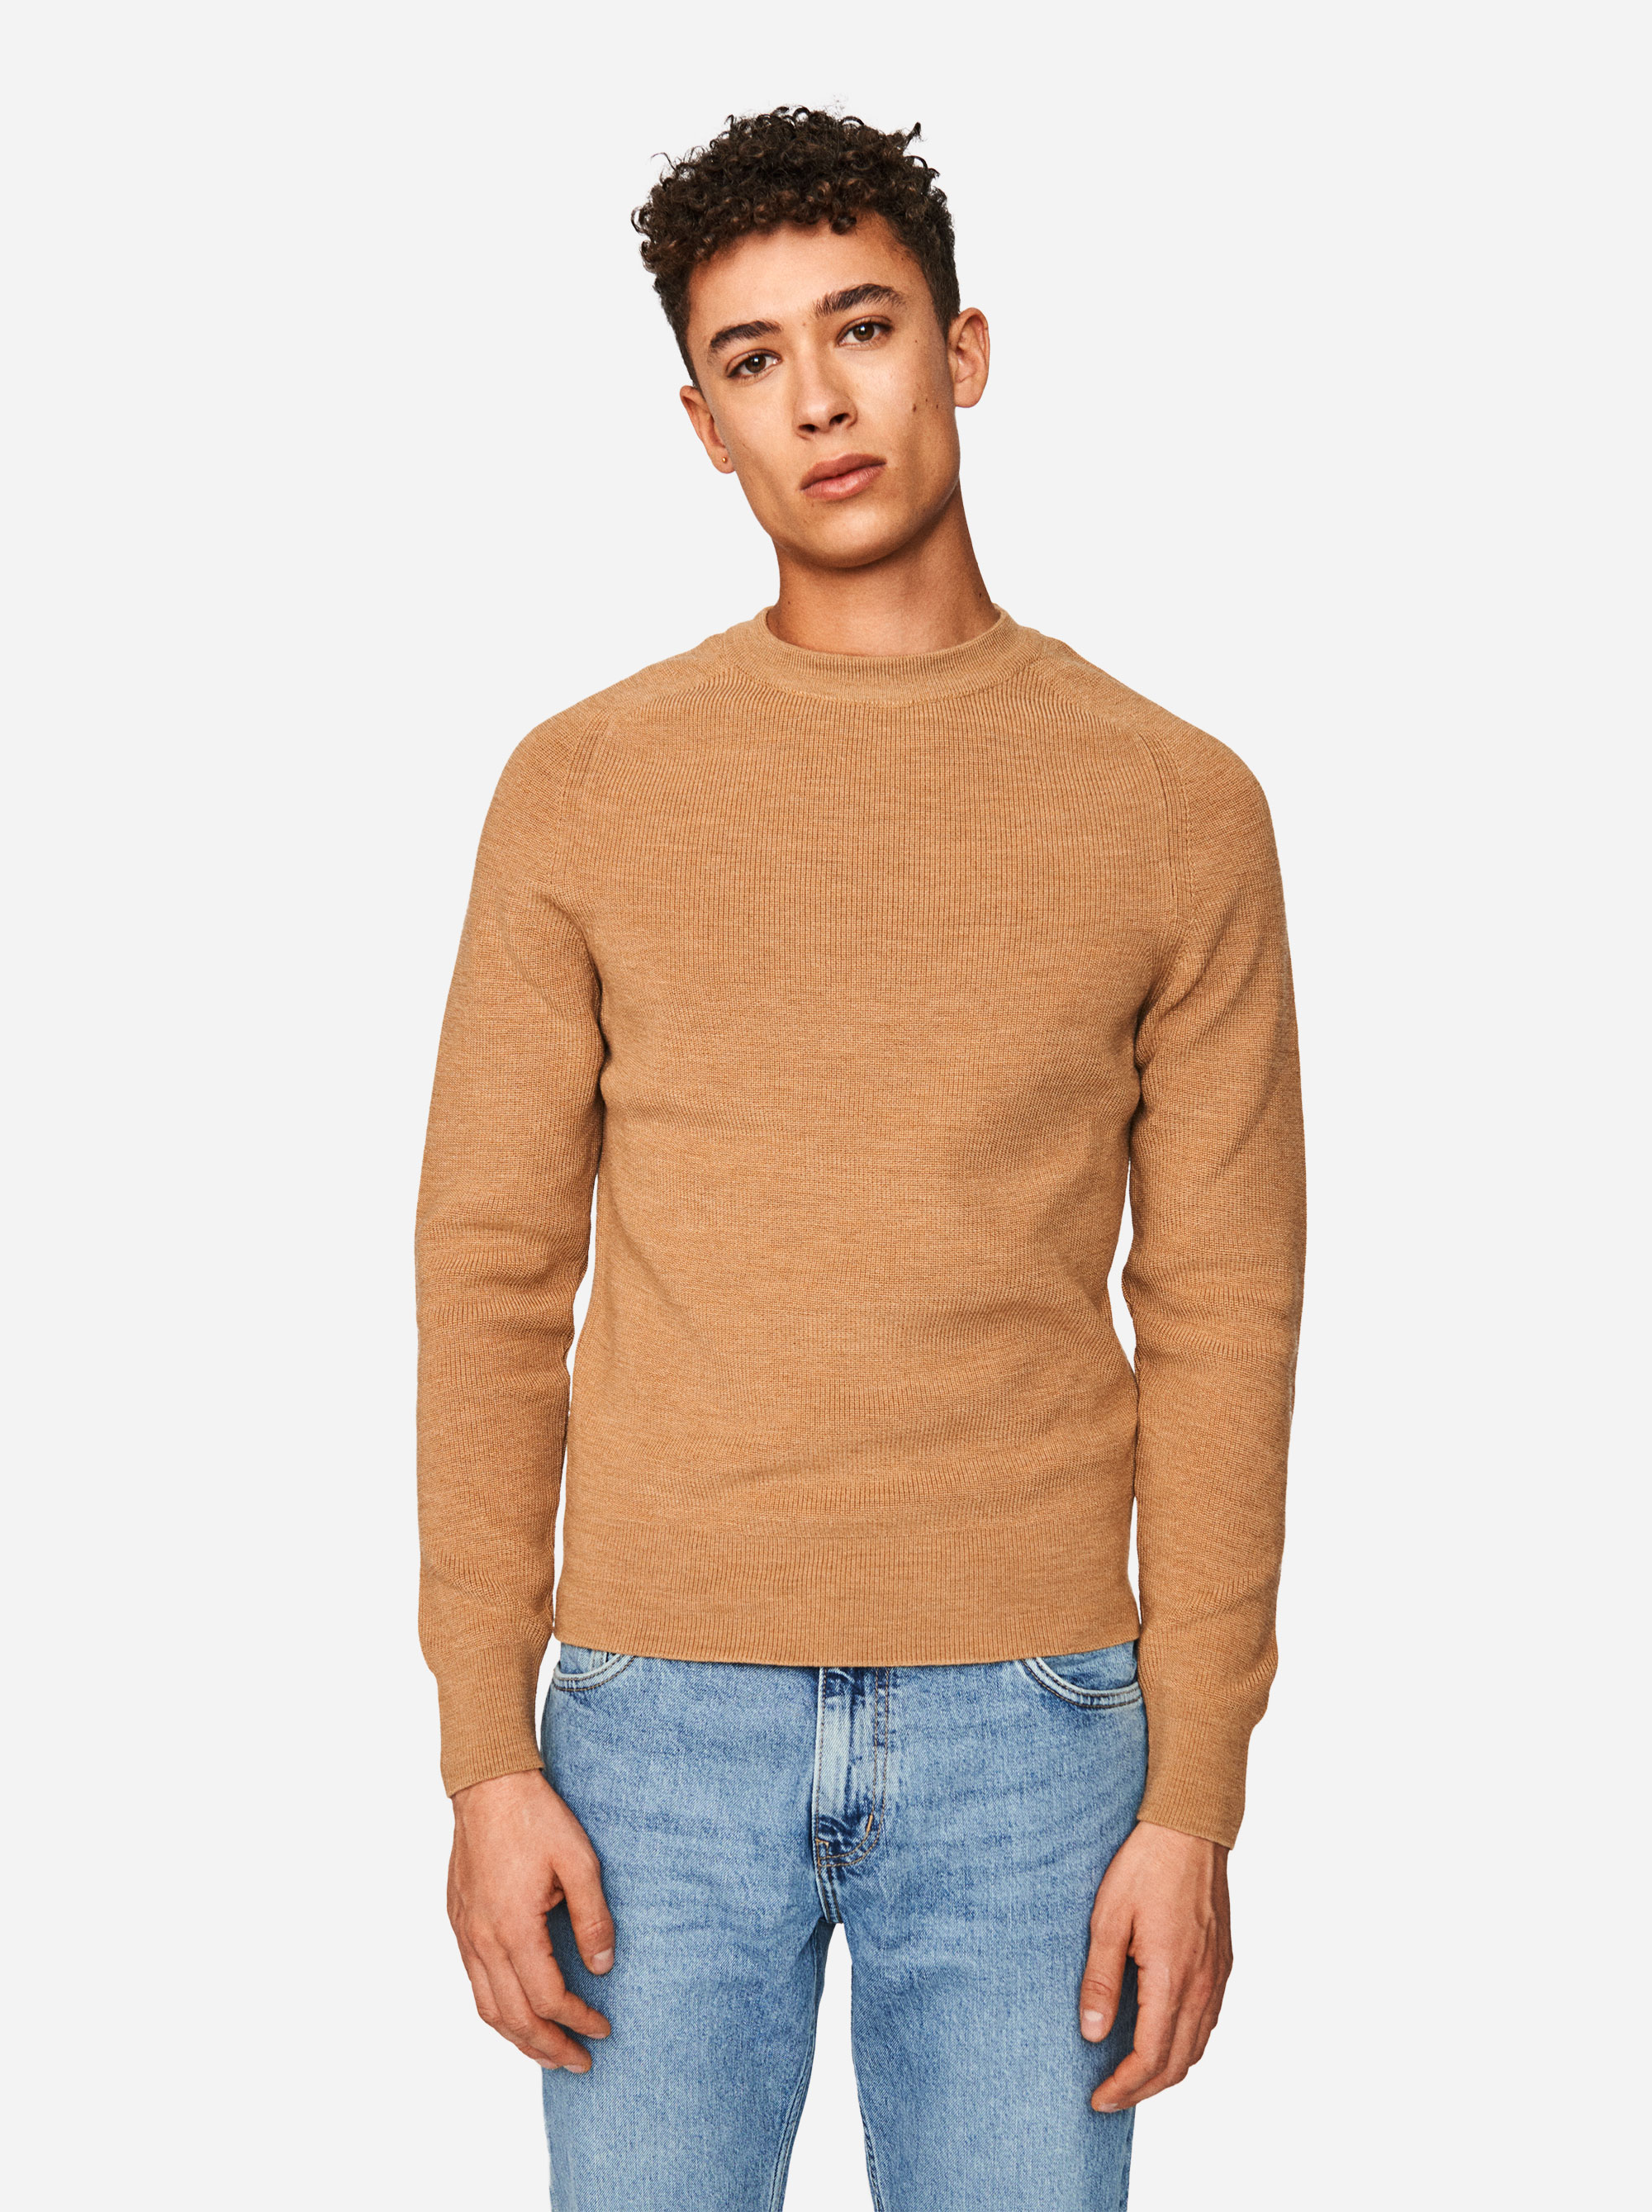 Teym - The Merino Sweater - Men - Camel - 3